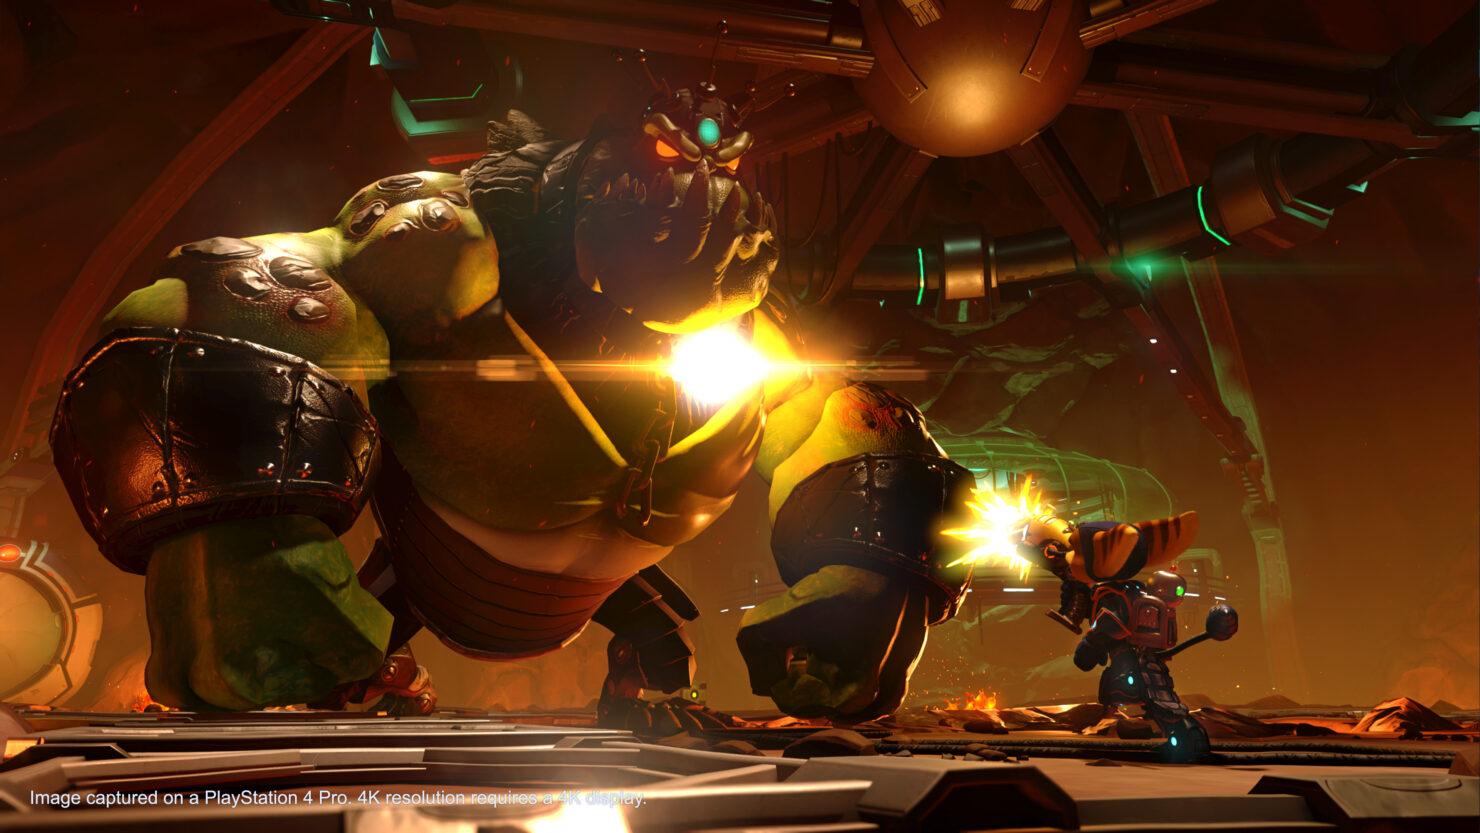 Ratchet & Clank PS4 Pro Update